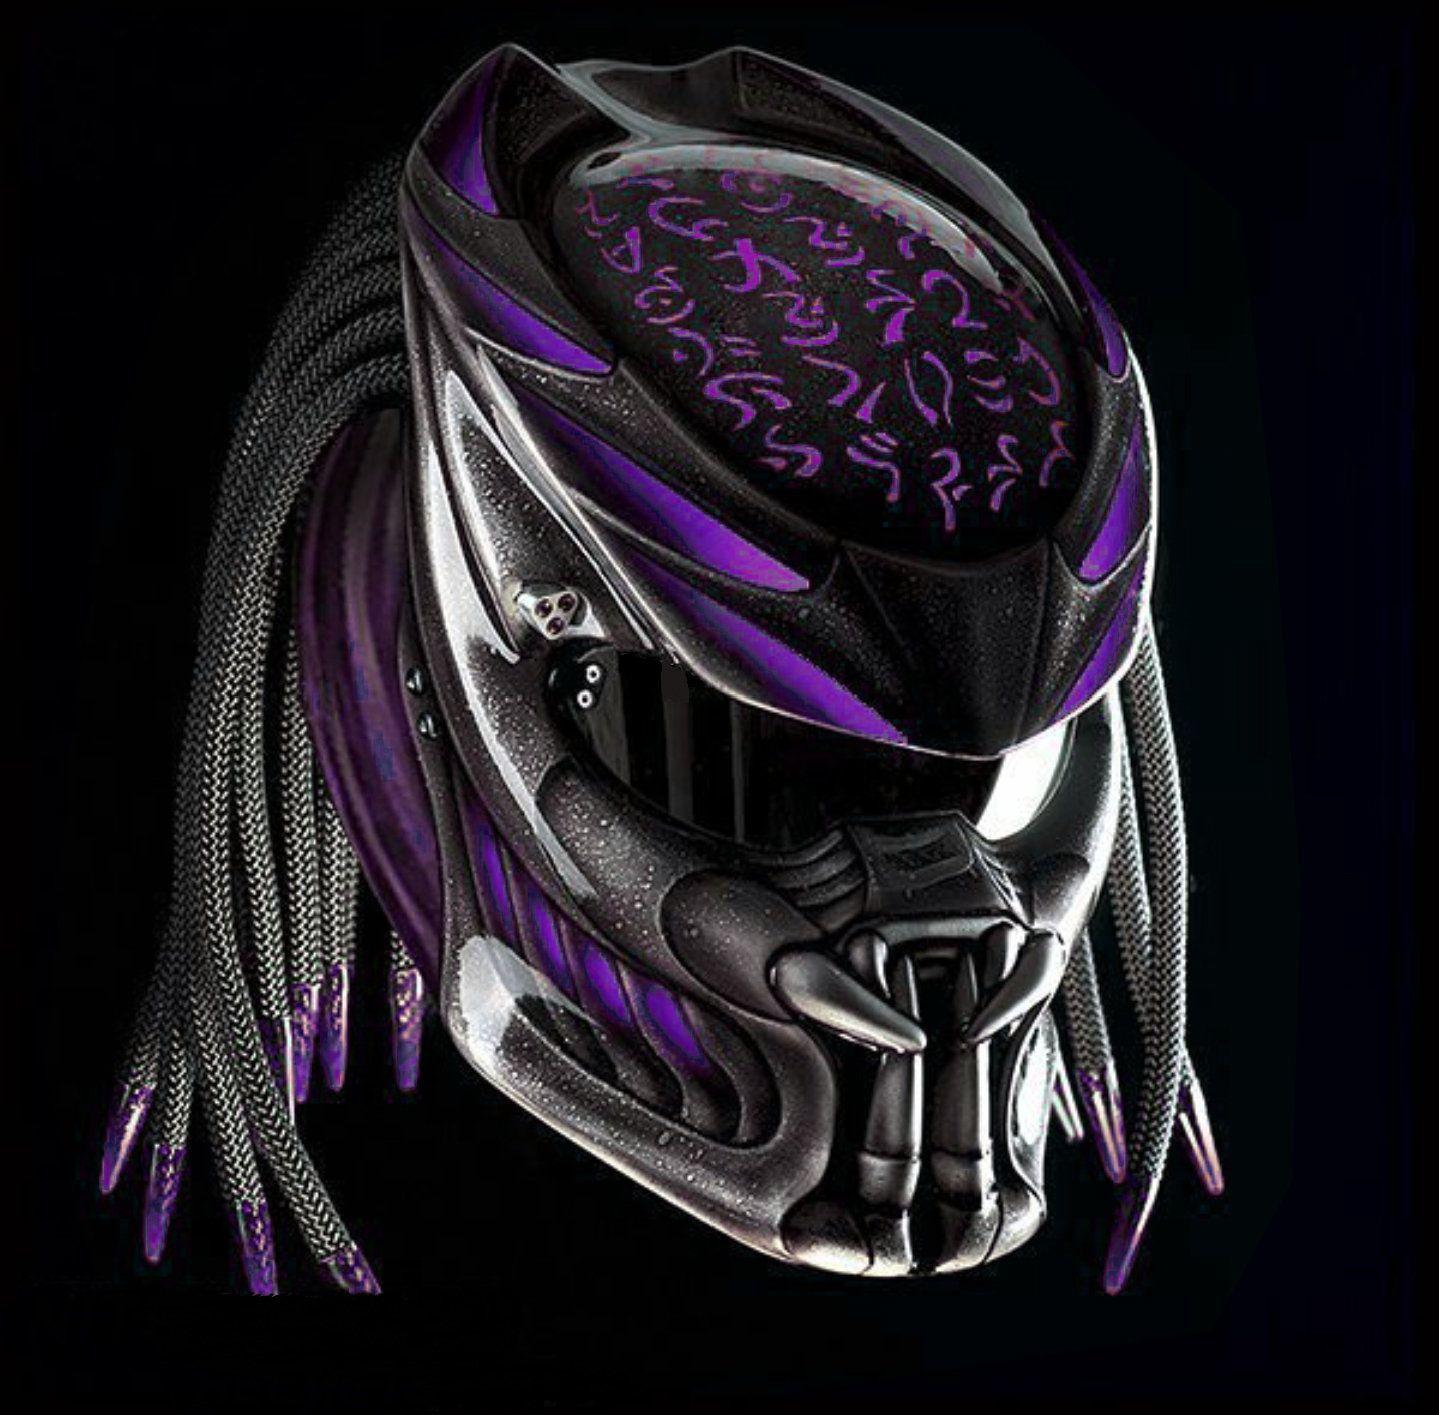 New Predator Helmet Motive Fire Purple Dot Ece Certified In 2021 Predator Helmet Motorcycle Helmets Helmet